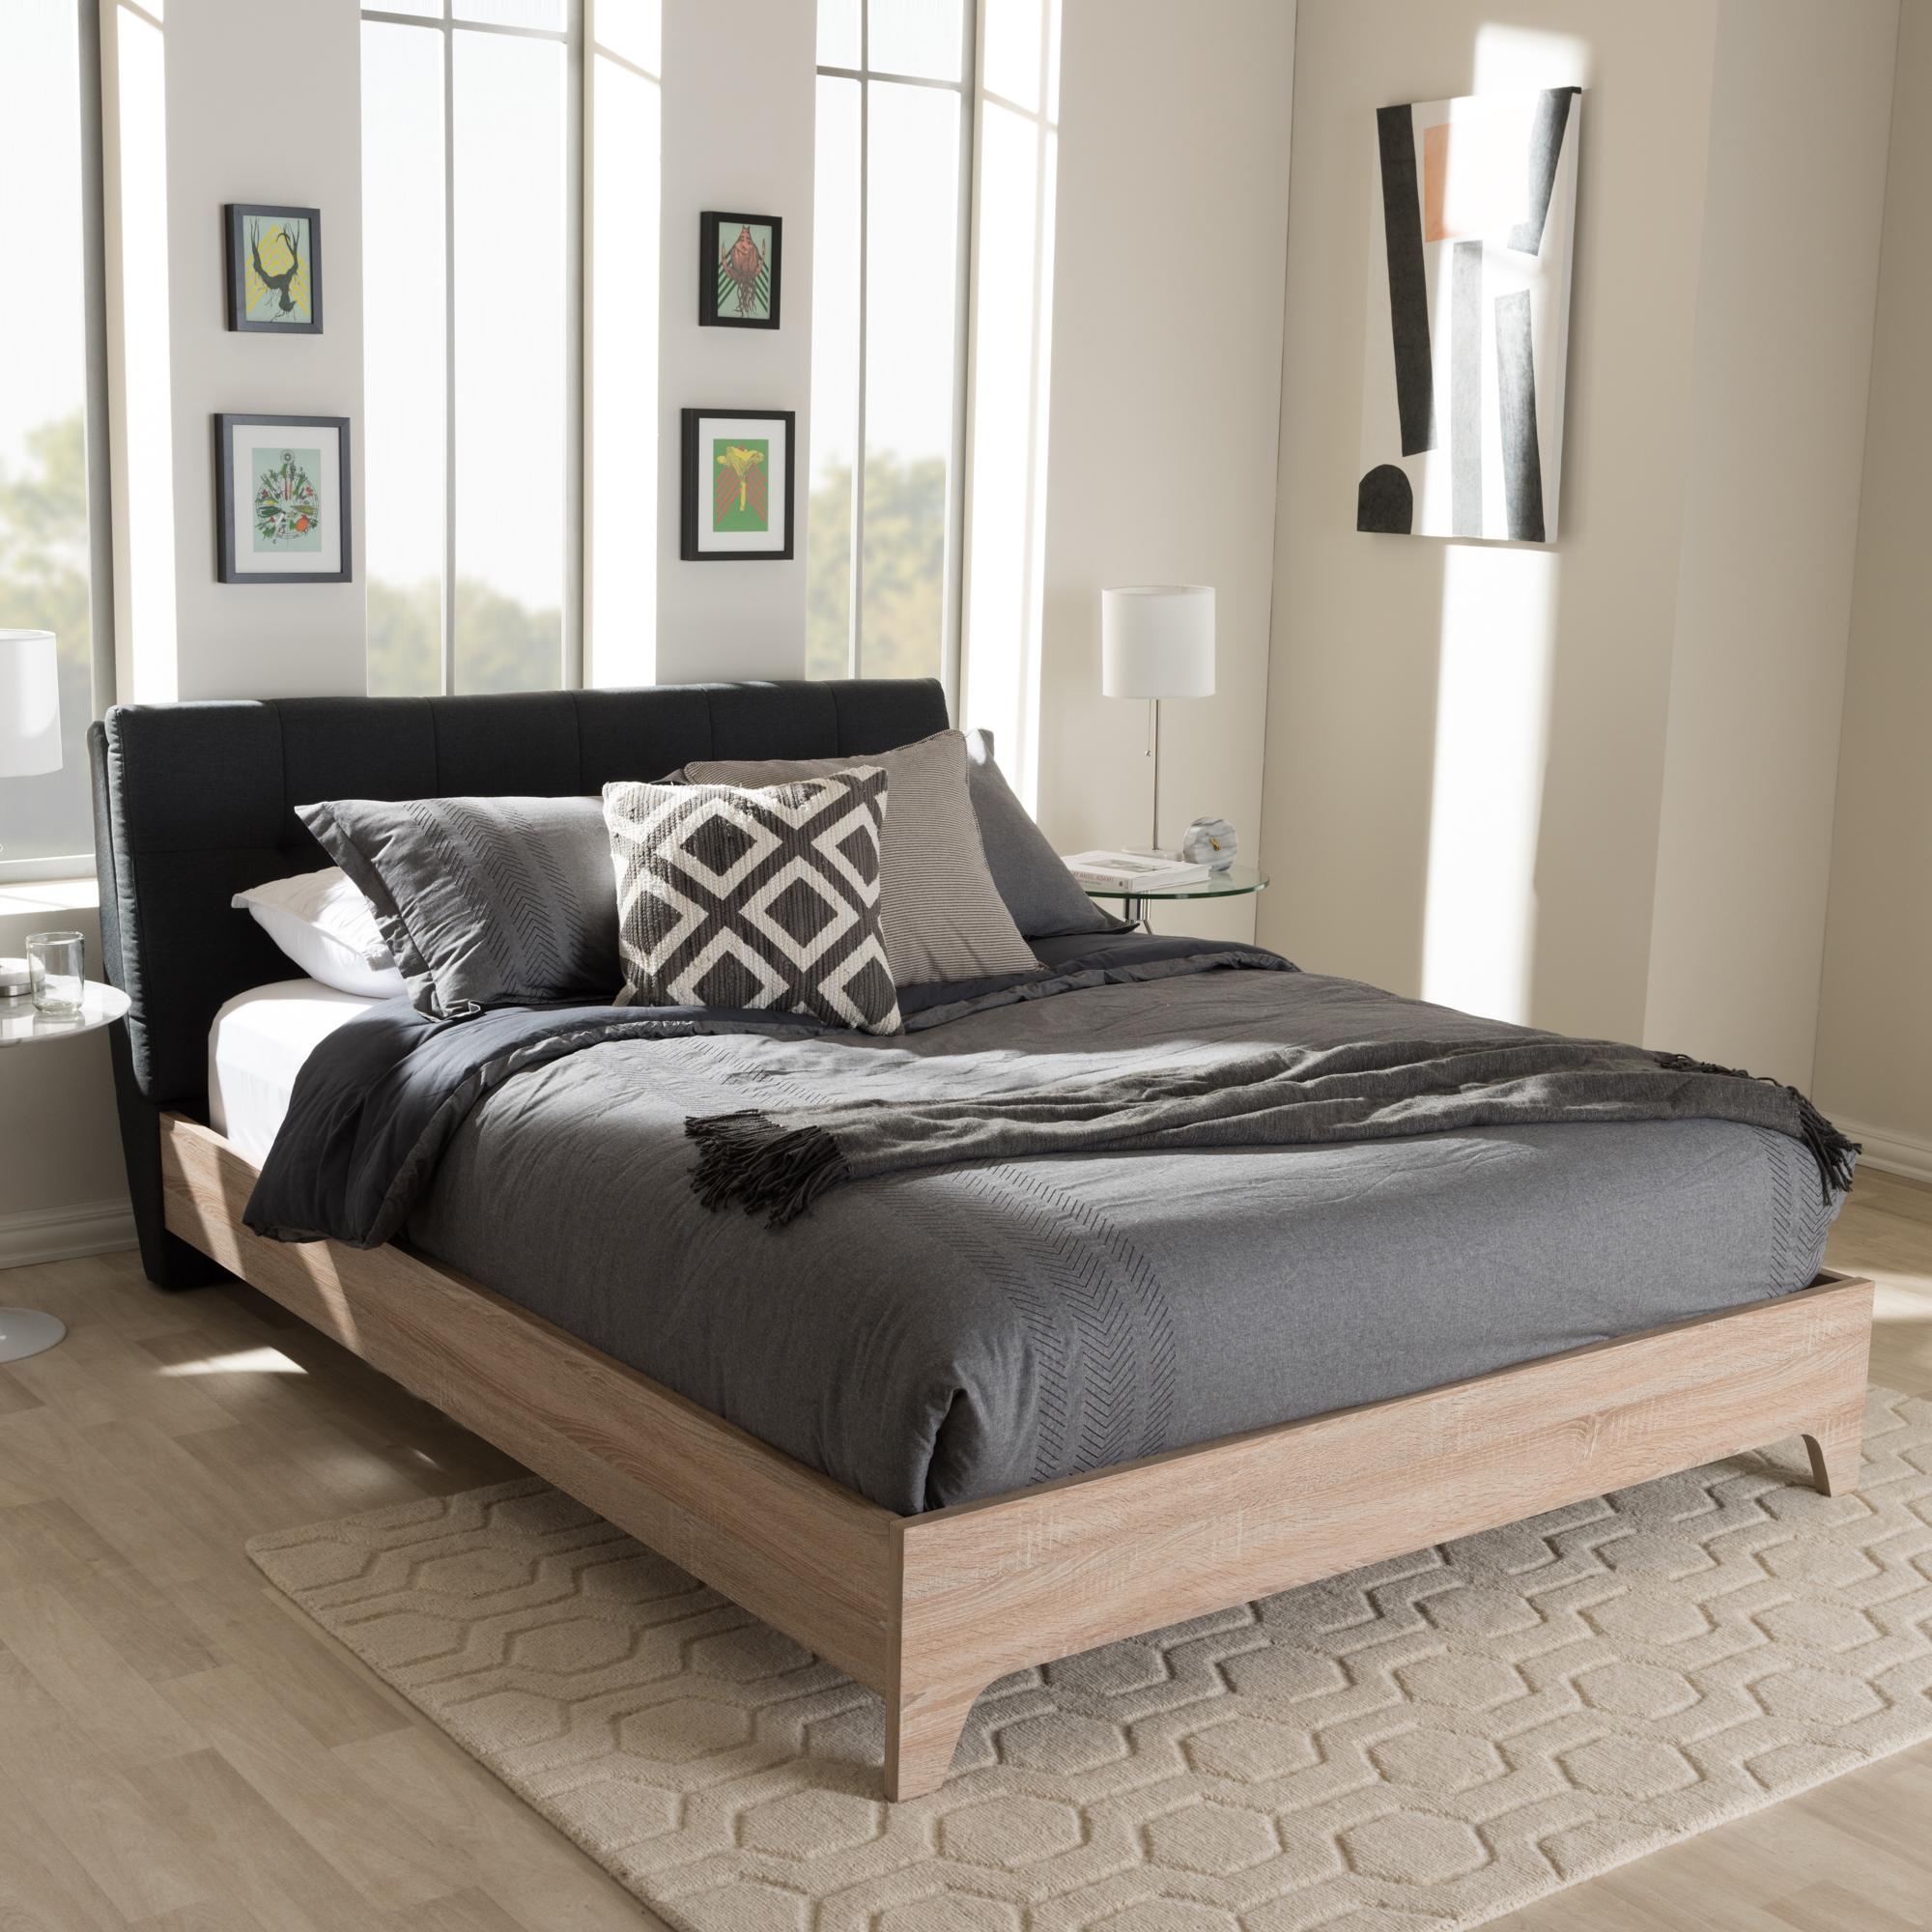 ... Baxton Studio Adelia Mid Century Charcoal Grey Whitewash Full Size  Platform Bed   BSOCF8821  ...